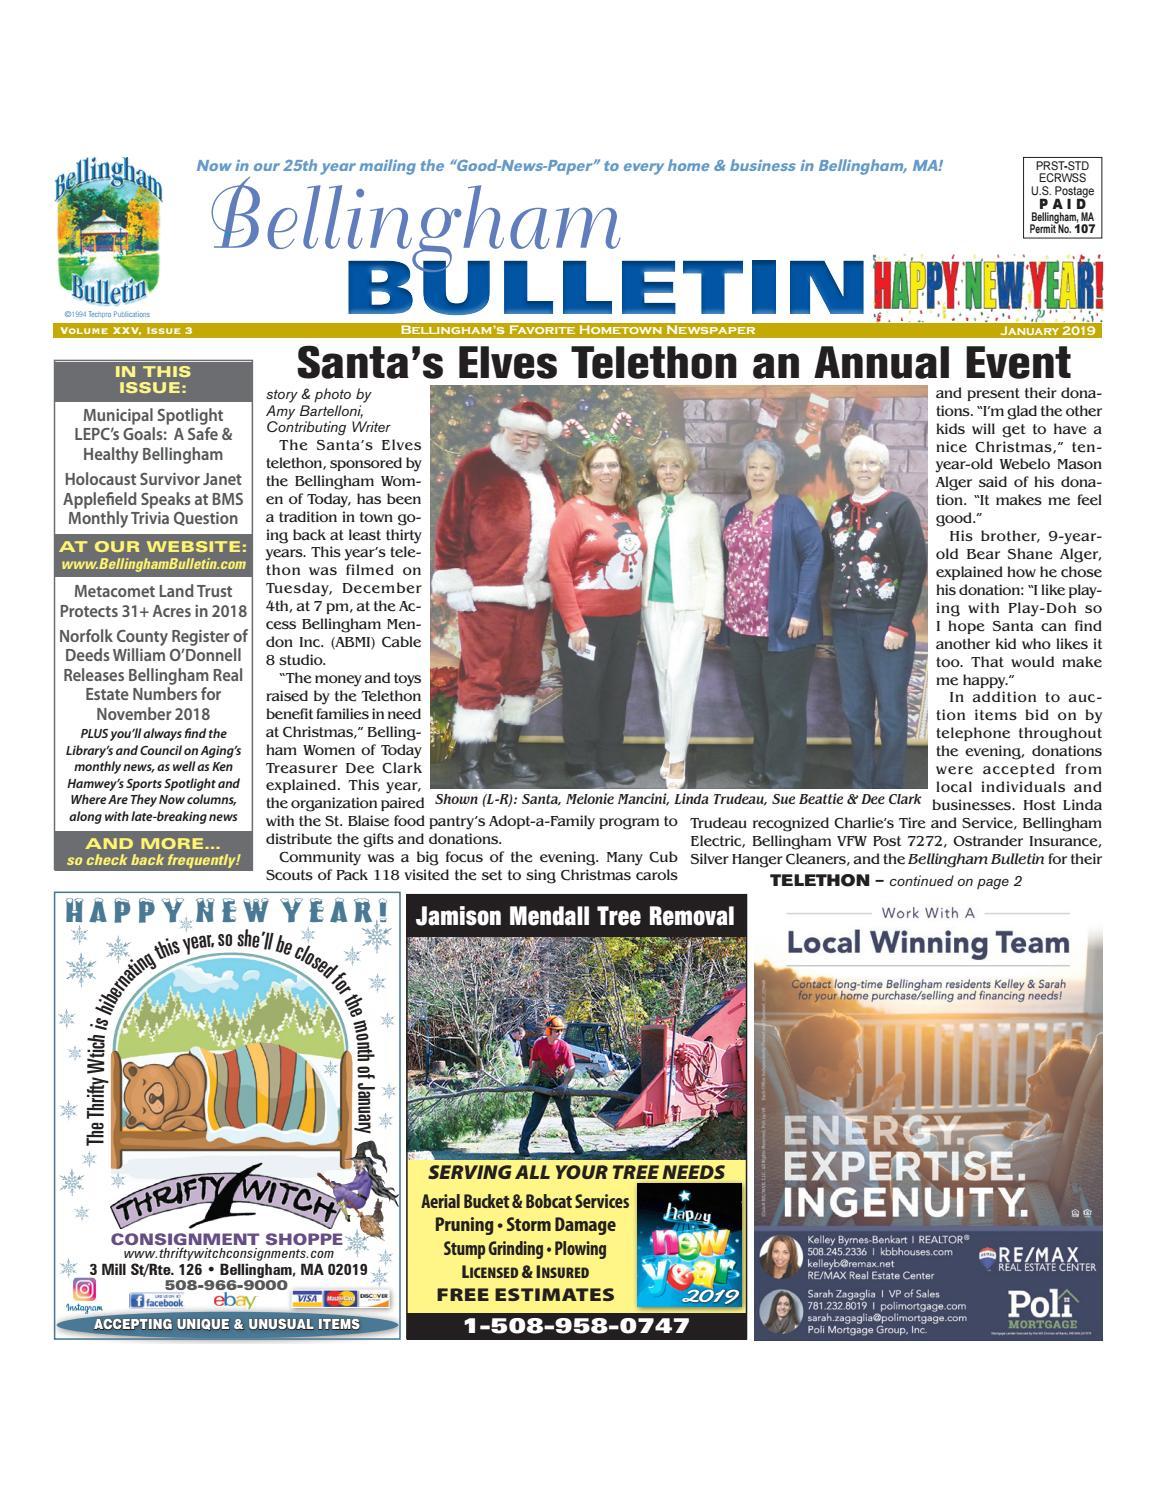 aae5b37062c9 Bellingham Bulletin January 2019 by Bellingham Bulletin - issuu